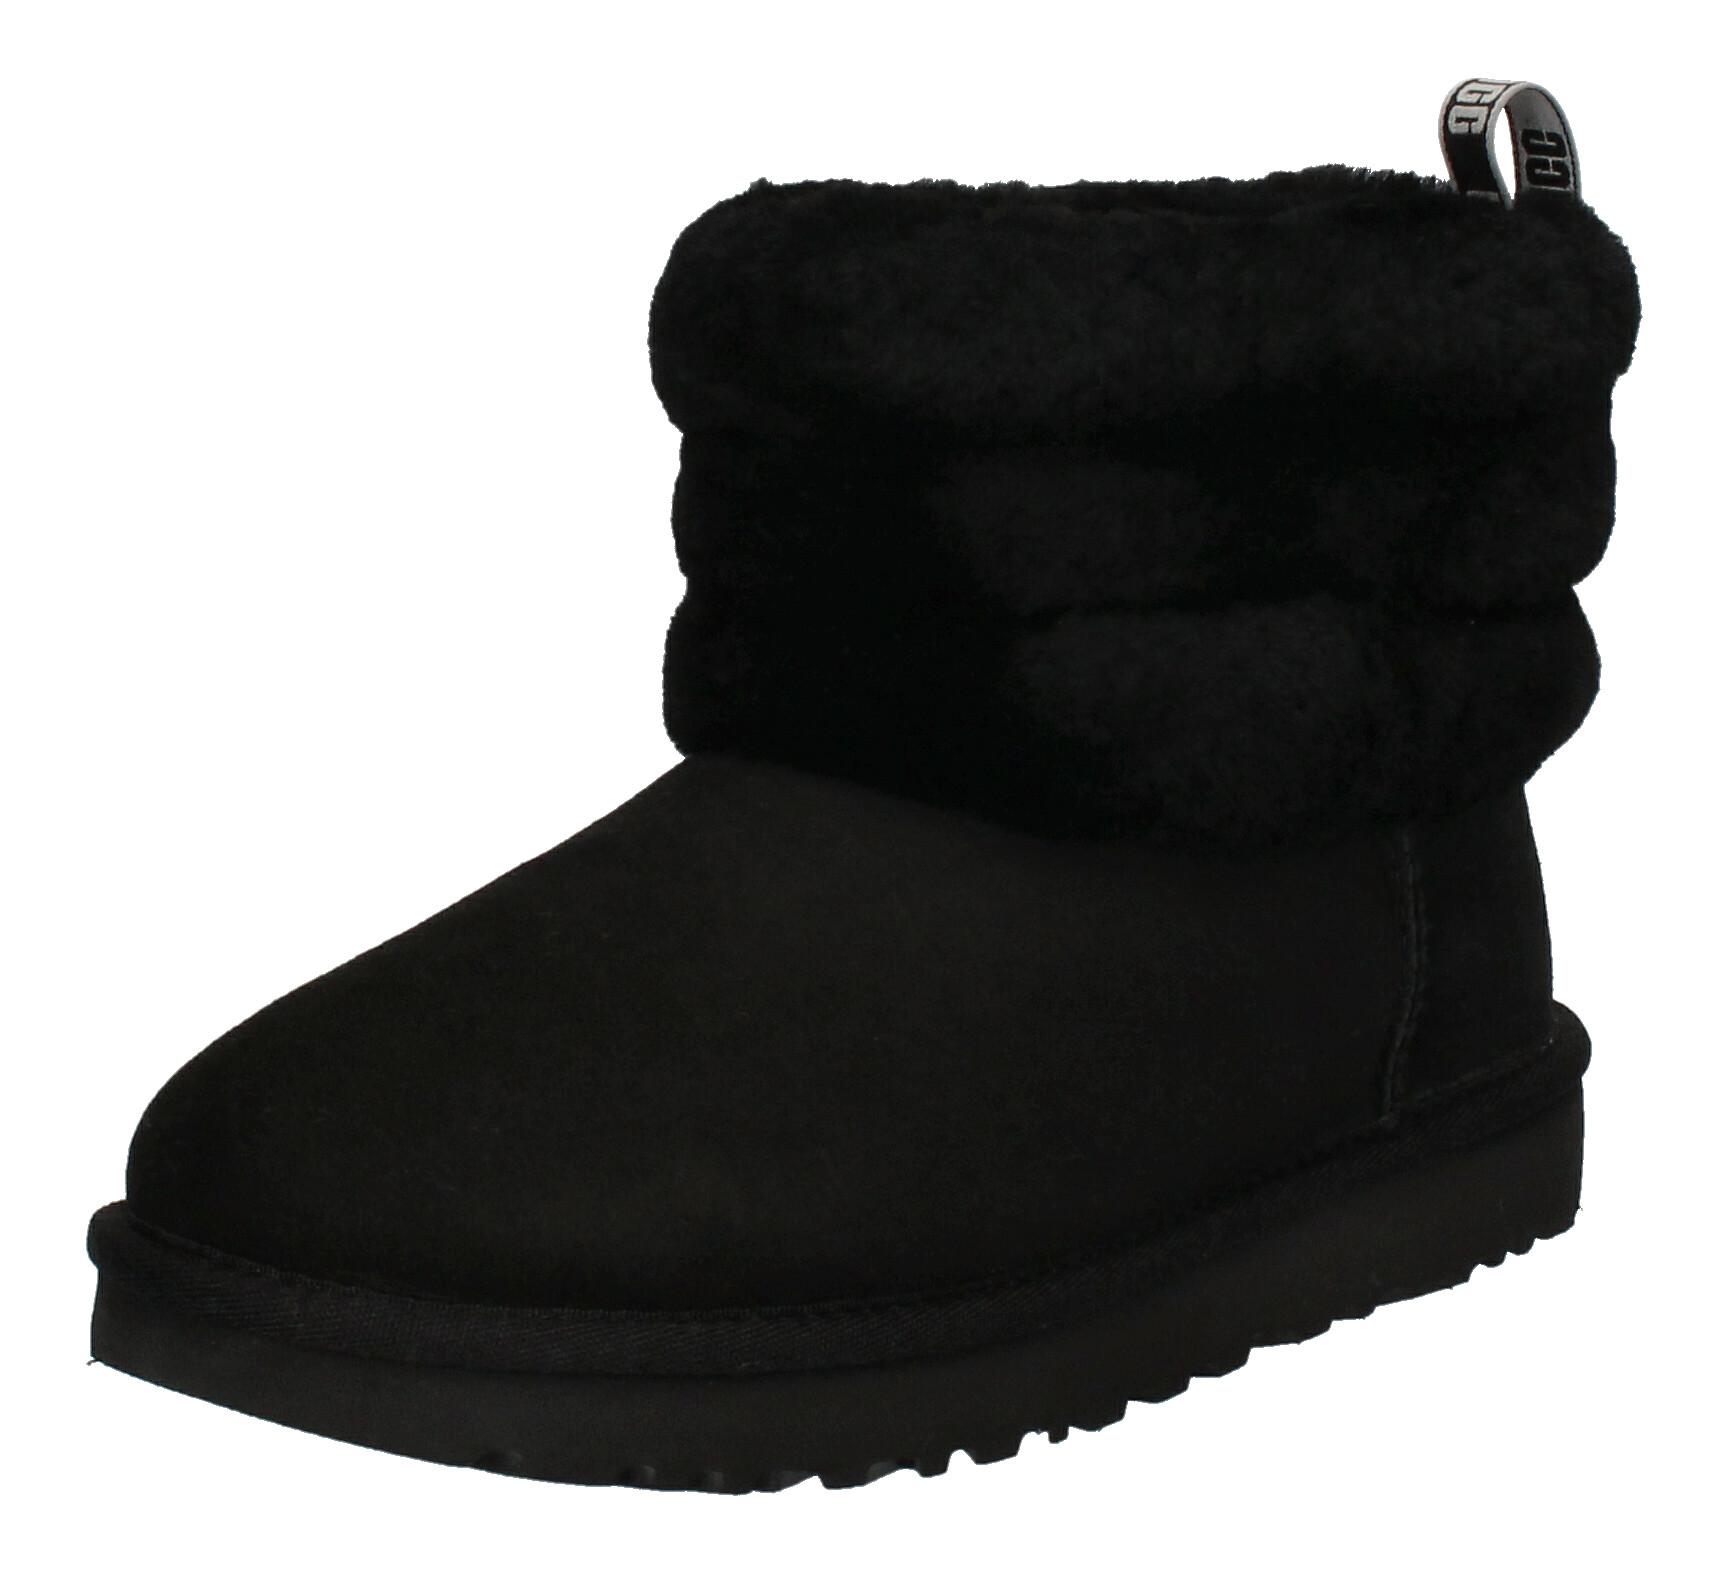 UGG Damenschuhe  Booties FLUFF MINI QUILTED - black_1